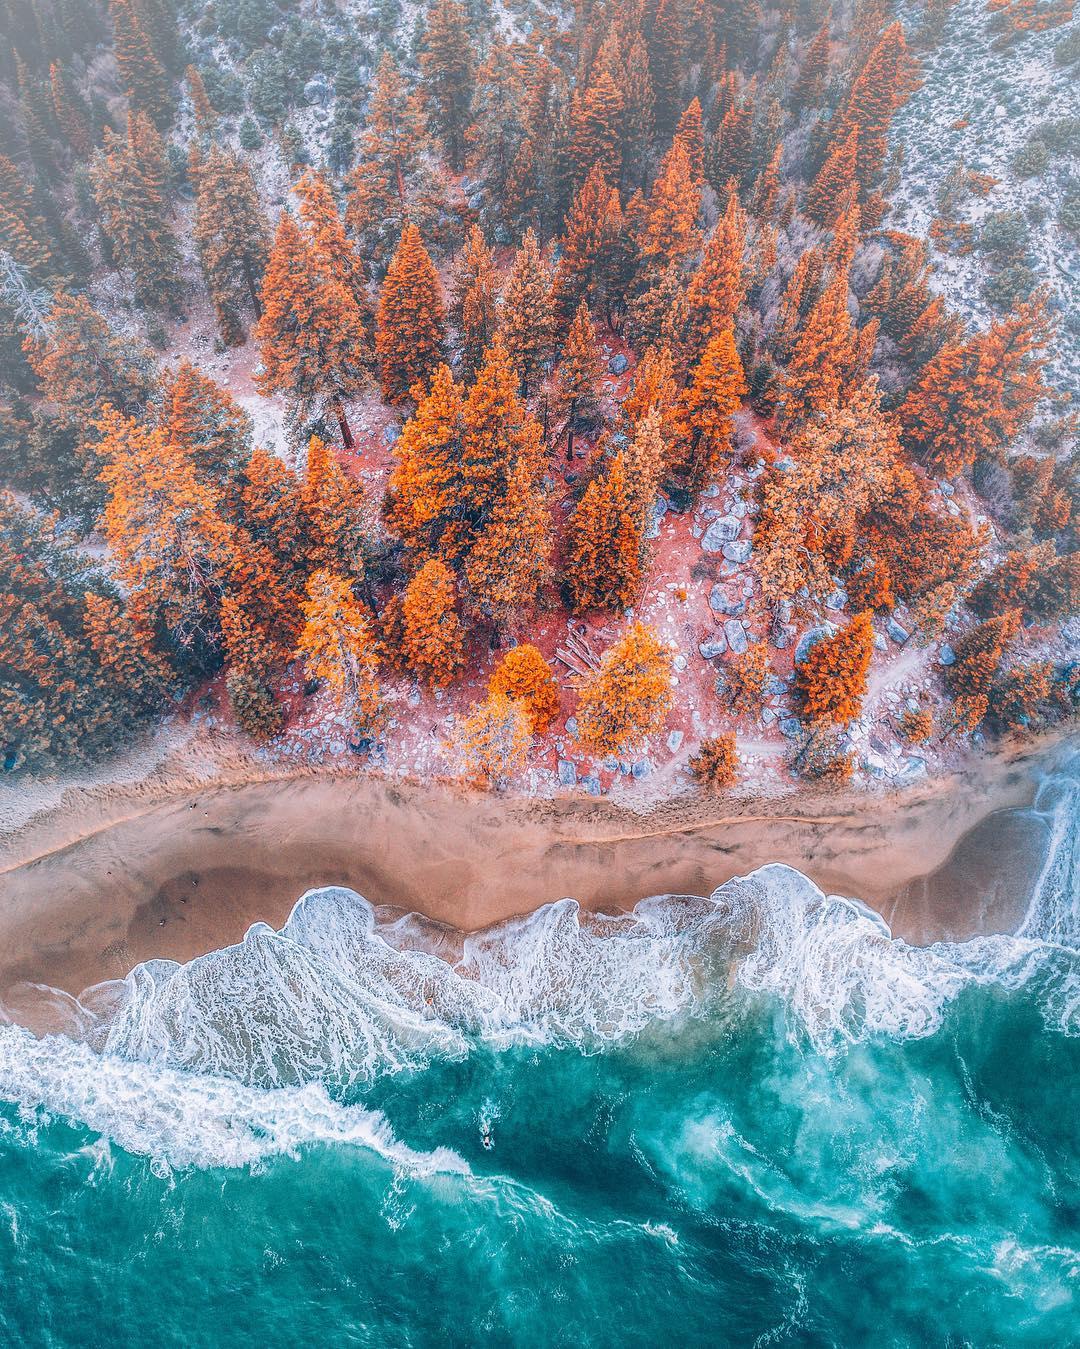 Потрясающие аэрофотоснимки от Ниаза Уддина